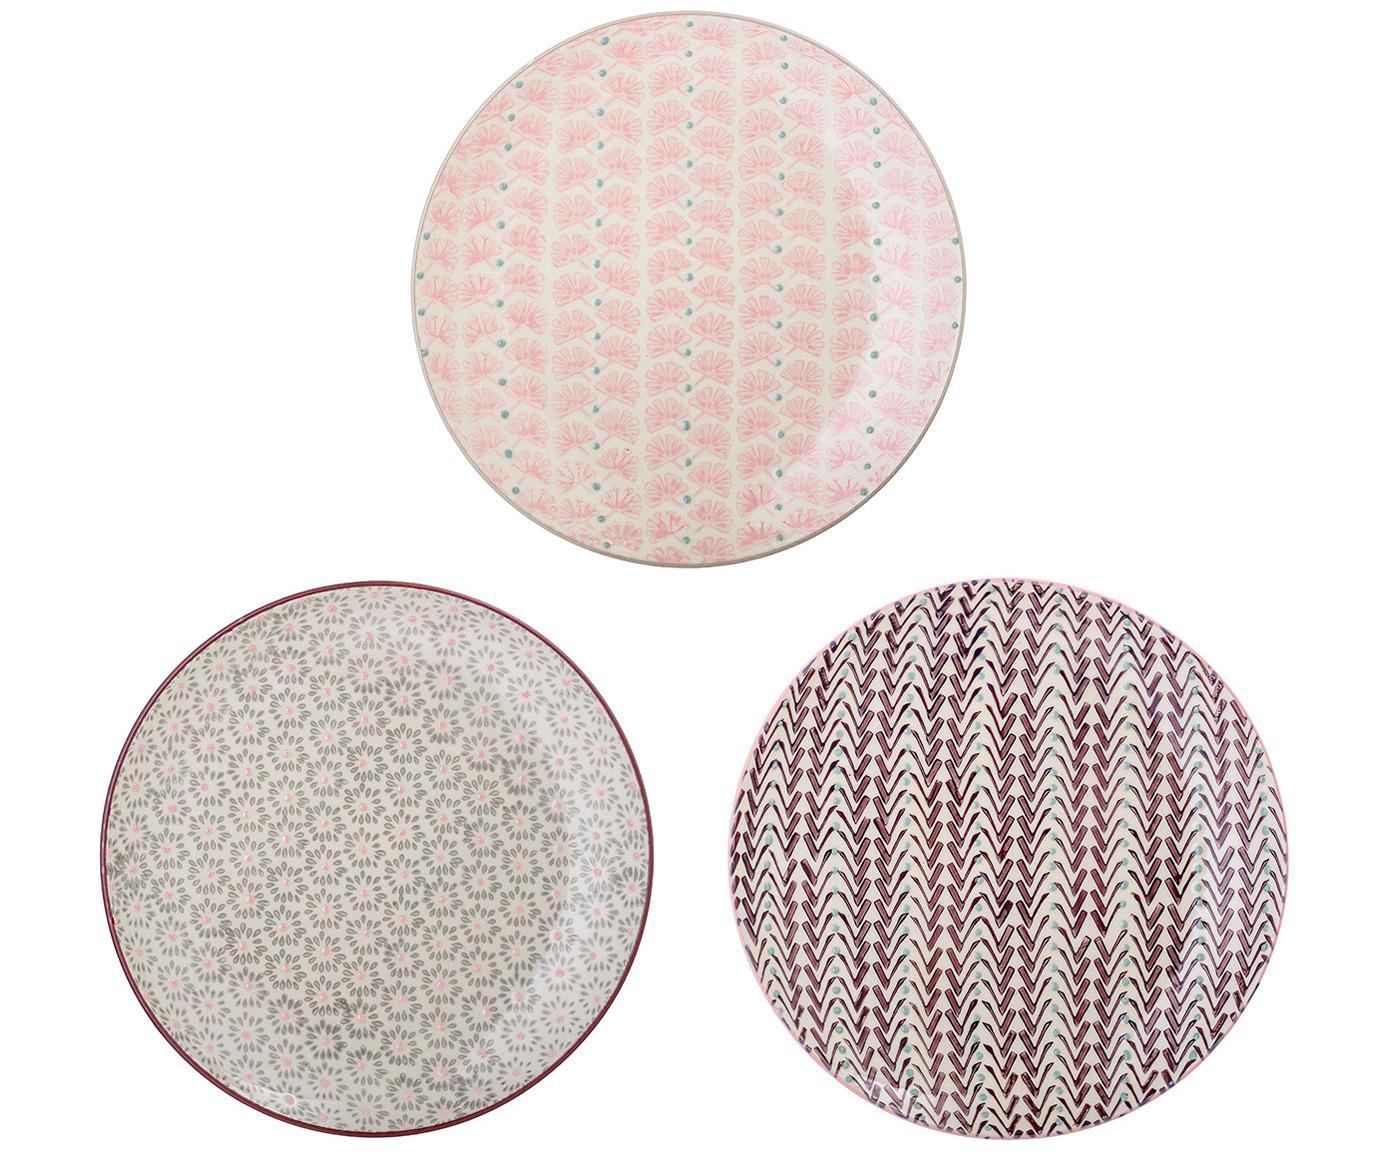 Set de platos postre Maya, 3pzas., Gres, Blanco crudo, verde, rosa, lila, Ø 22 cm